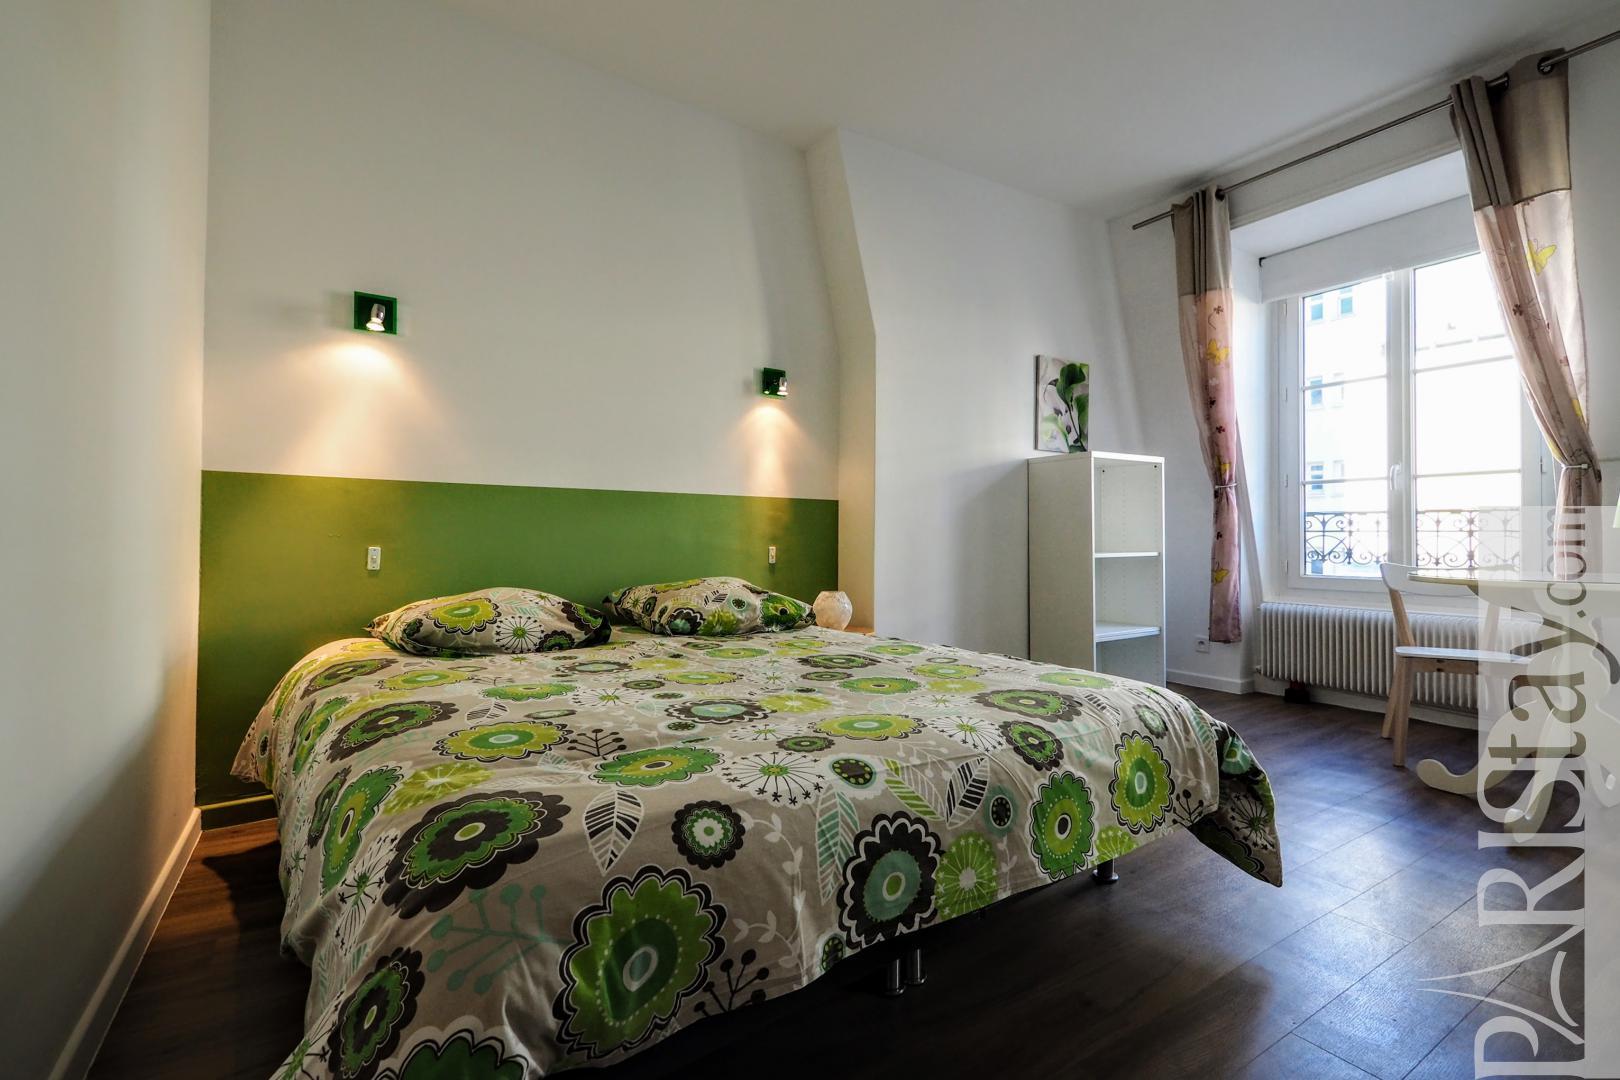 Paris 2 bedroom apartment for rent furnished republique temple